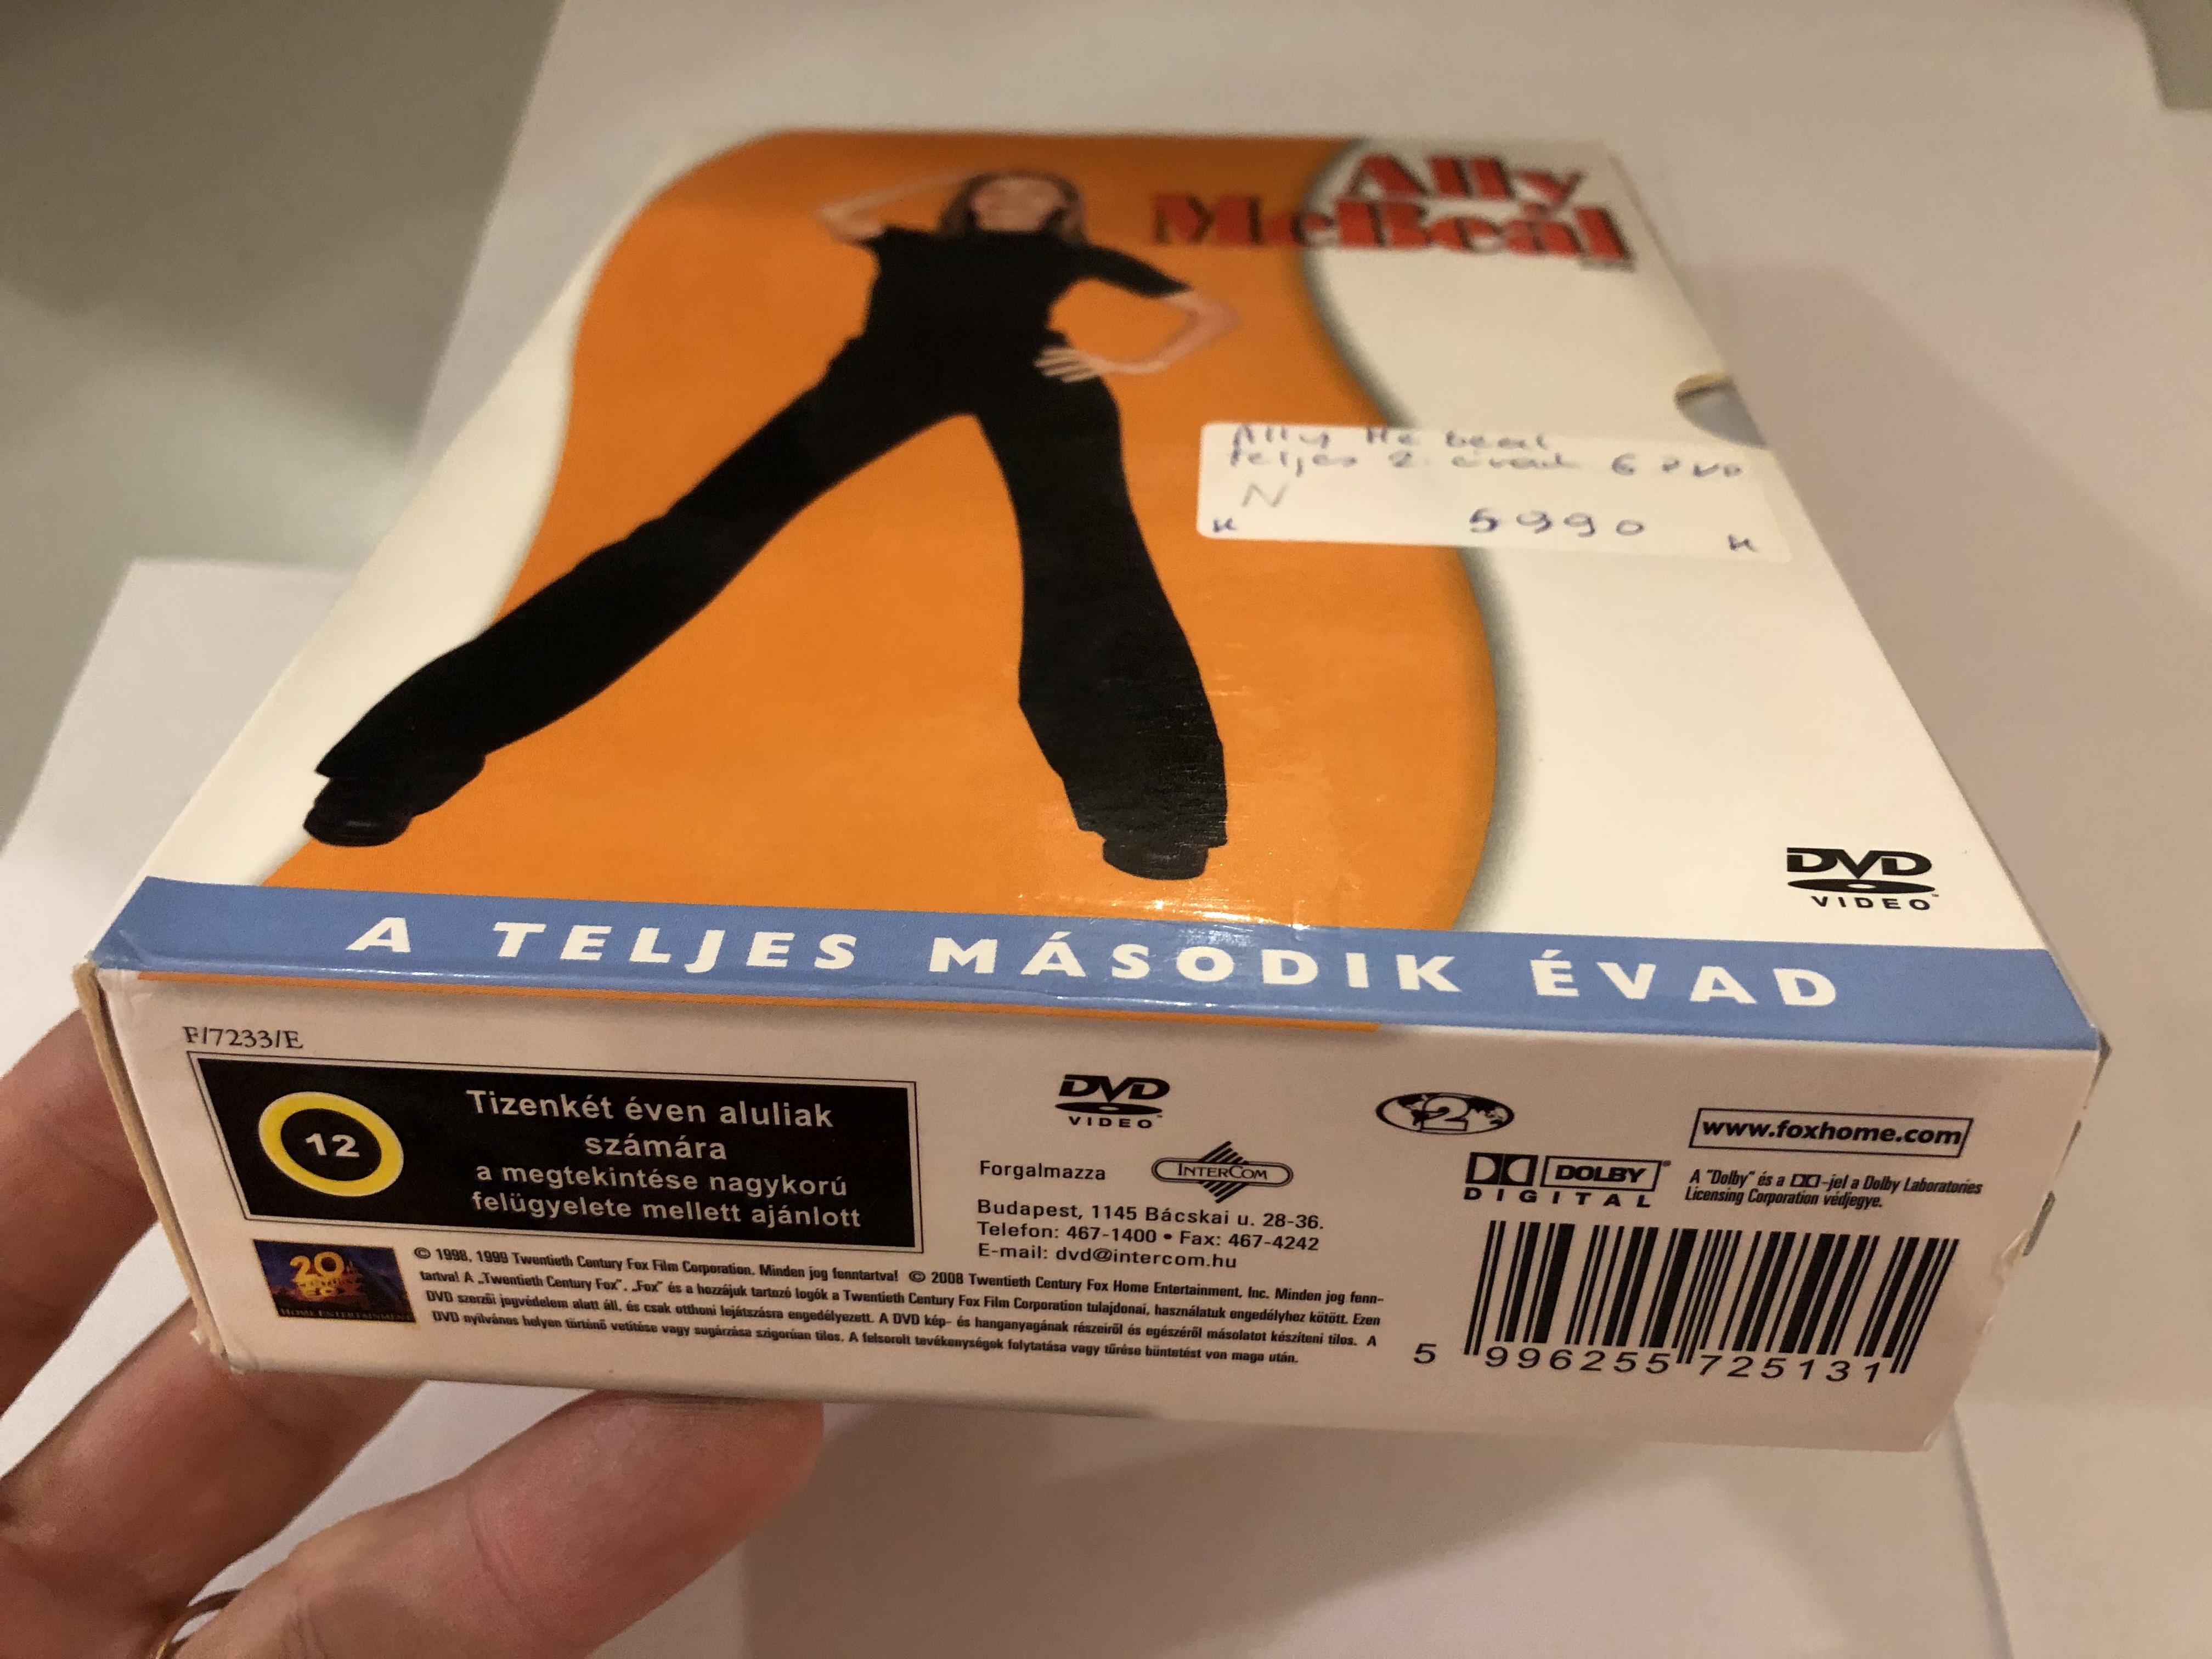 ally-mcbeal-season-two-dvd-ally-mcbeal-a-teljes-m-sodik-vad-created-by-david-e.-kelley-2-.jpg